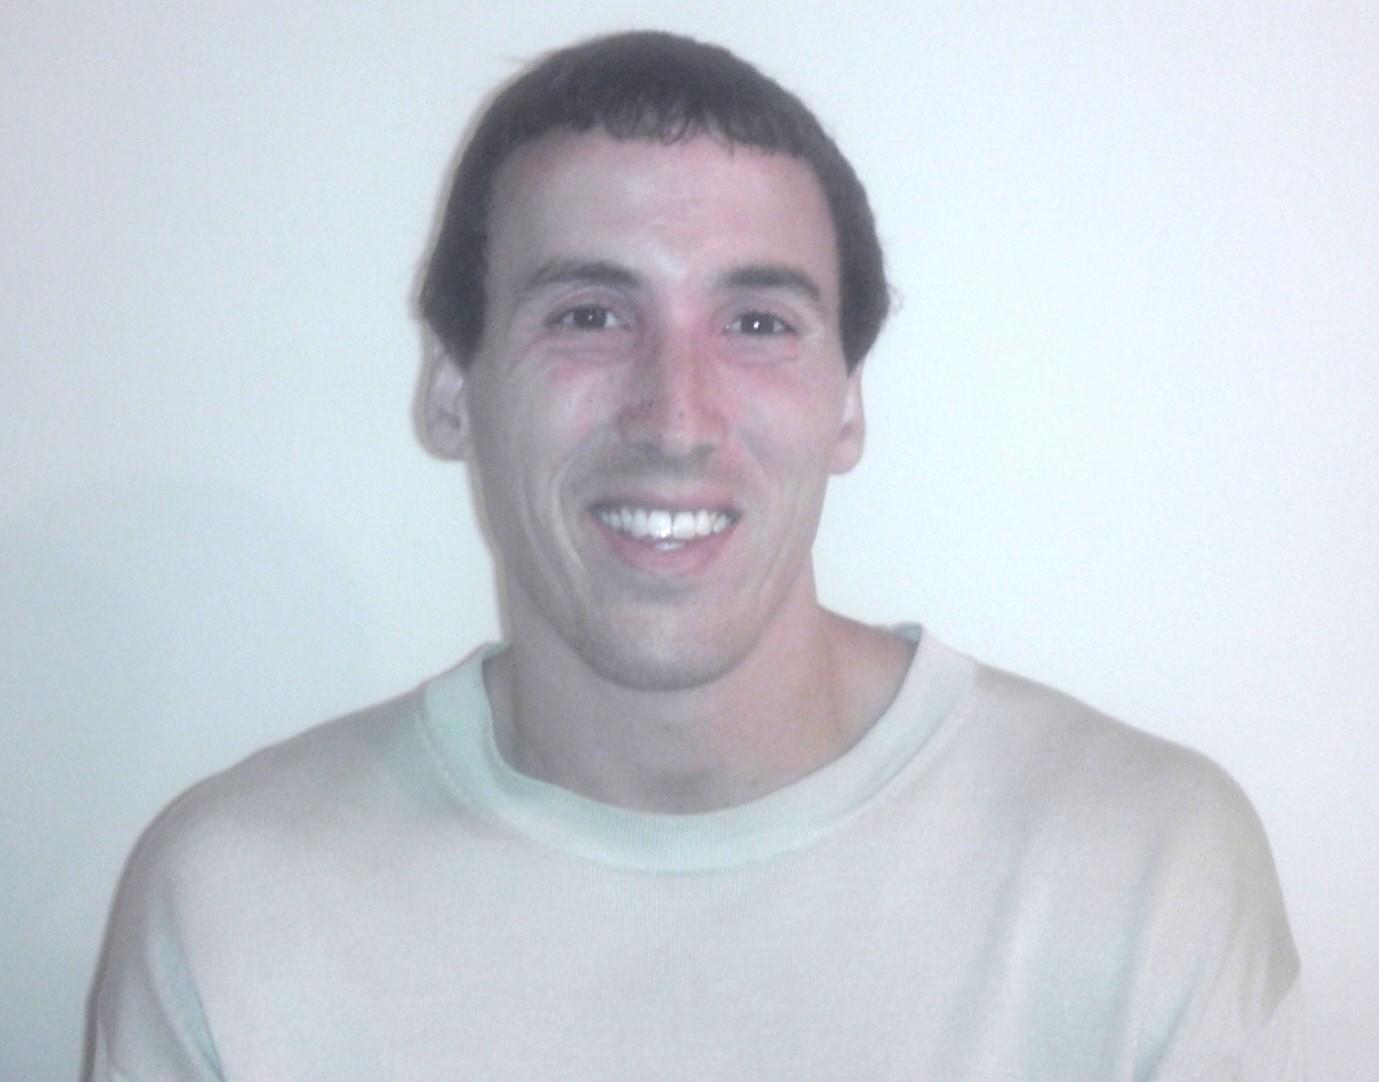 <b>Michael Phipps</b> (Florida Institute of Technology) - Phipps